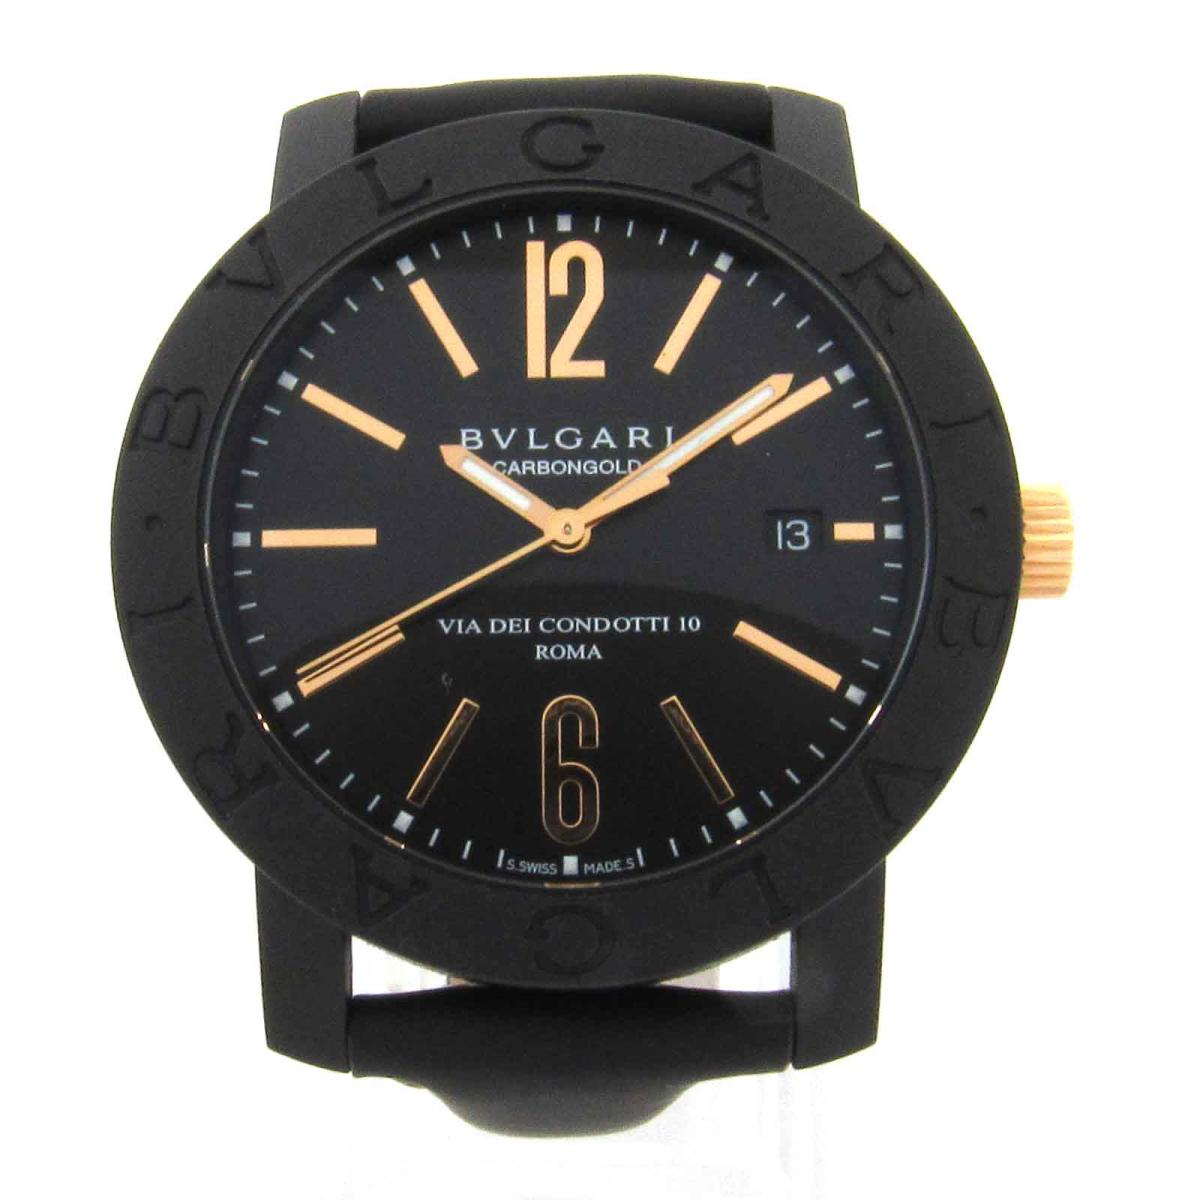 a30dcb6f9bb1 ブルガリ 裏スケルトン ウォッチ 腕時計 時計 メンズ レディース レザー ...